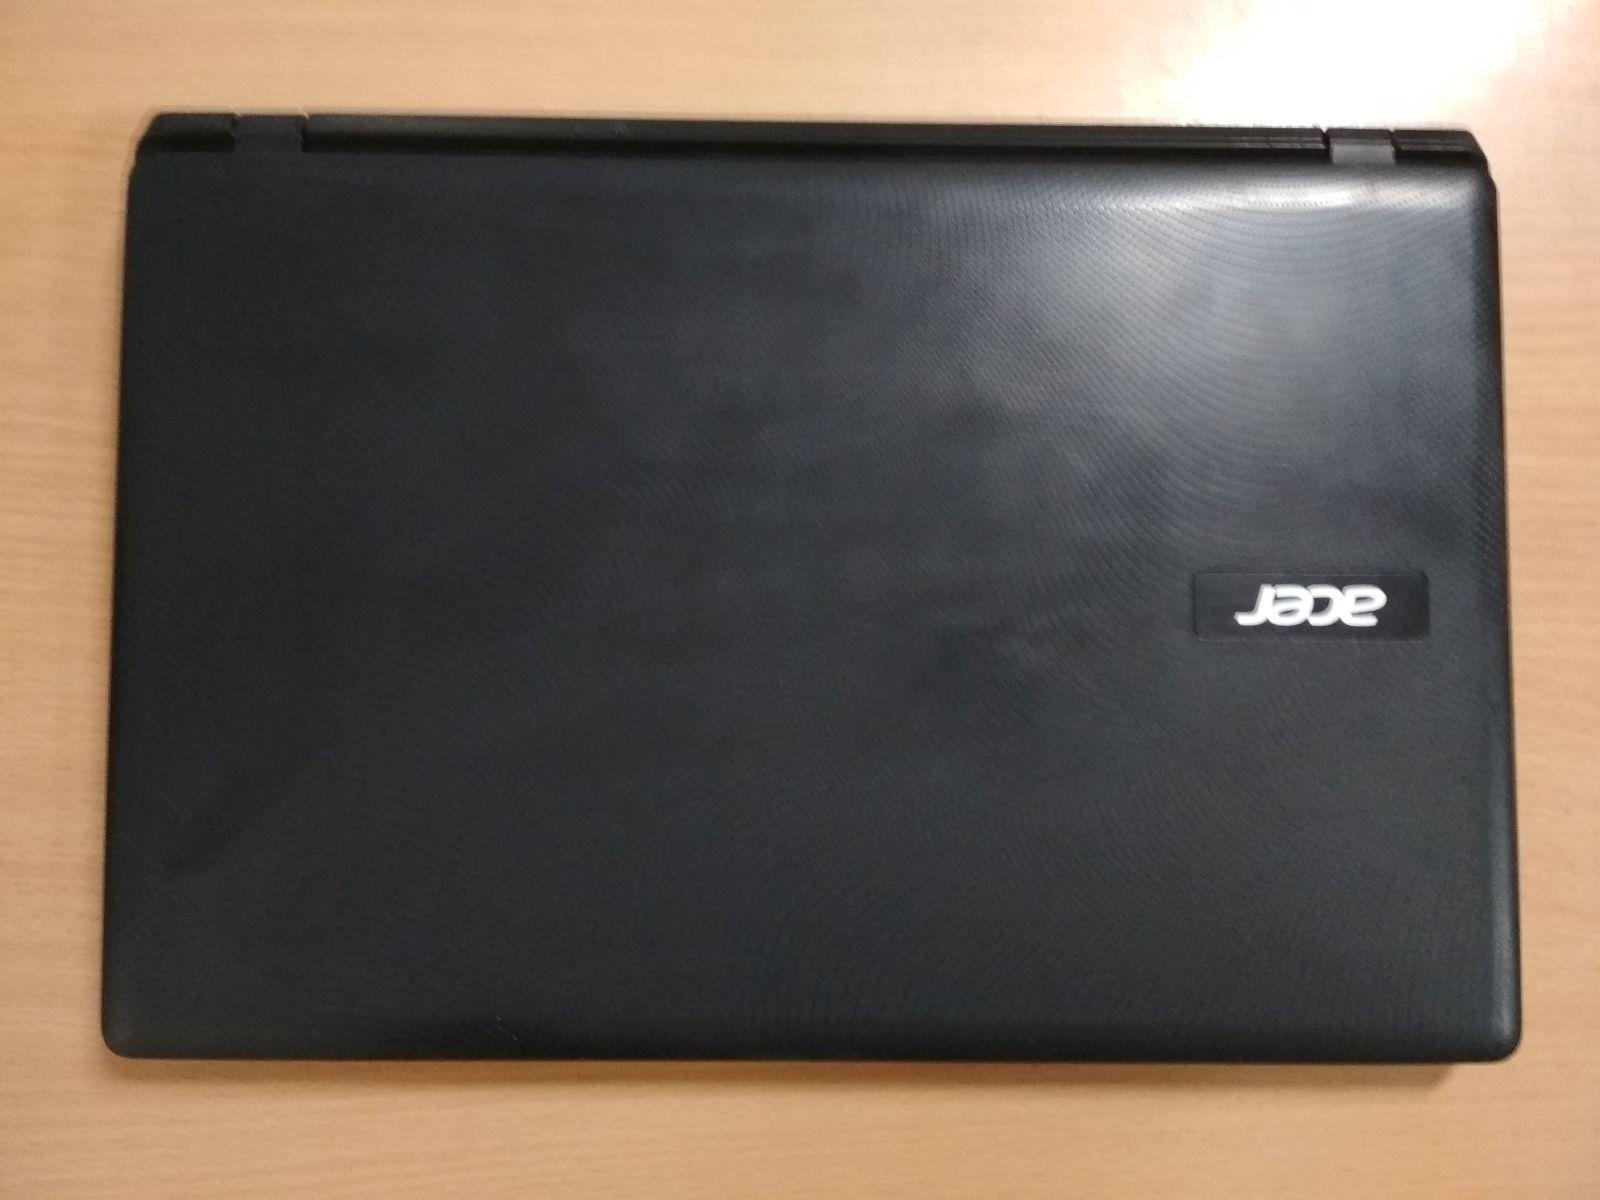 Acer Aspire ES1-520-365Z AMD E1-2500 / 4GB / 500GB HDD használt 3 hó gar!